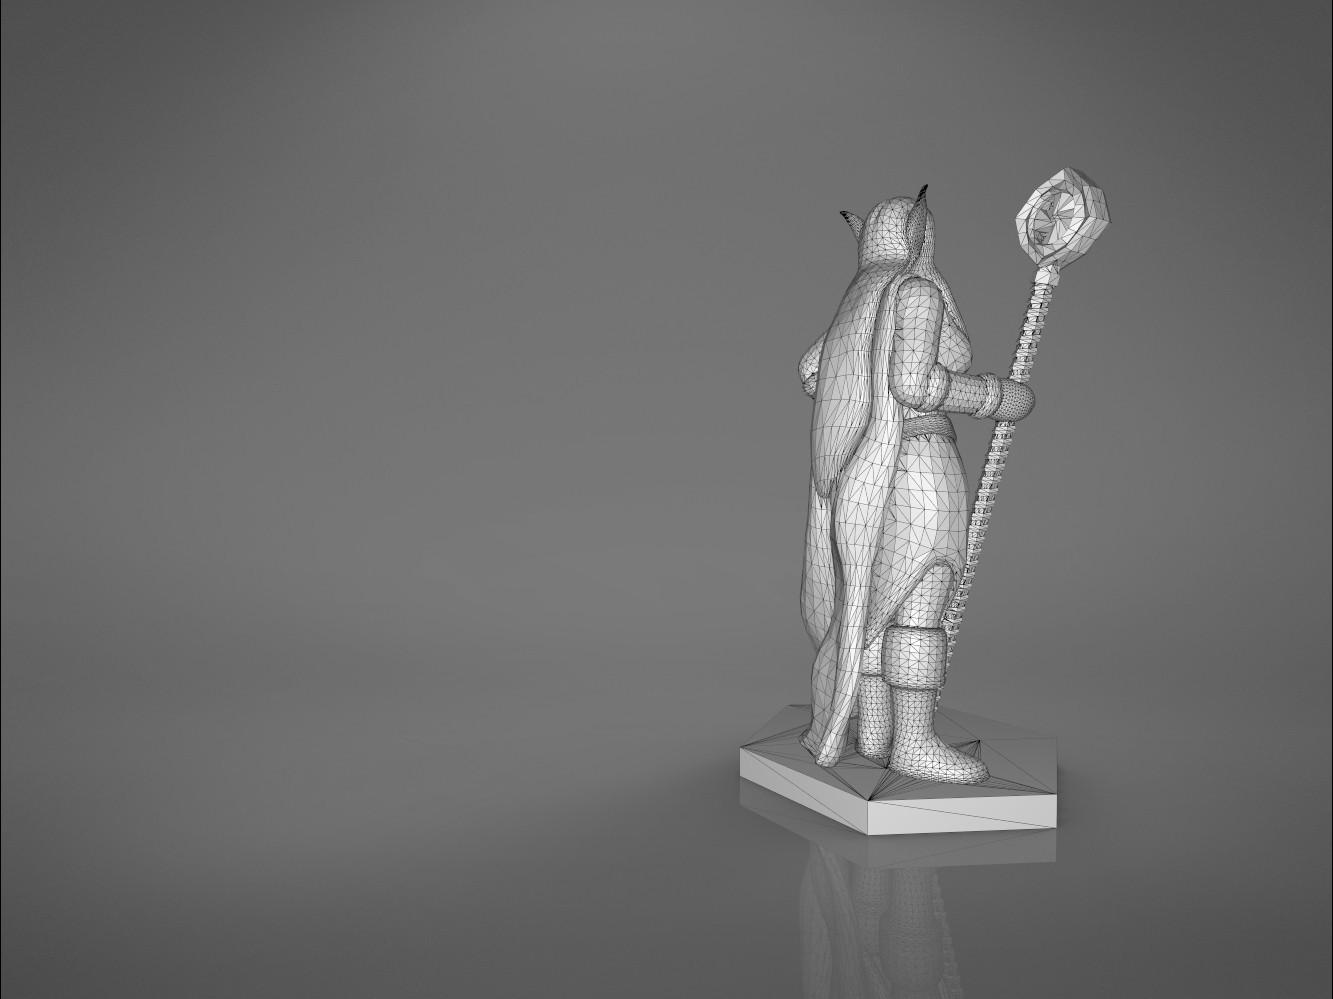 Mage_2_-main_render_2.181.jpg Download STL file ELF MAGE FEMALE CHARACTER GAME FIGURES 3D print model • 3D printing template, 3D-mon